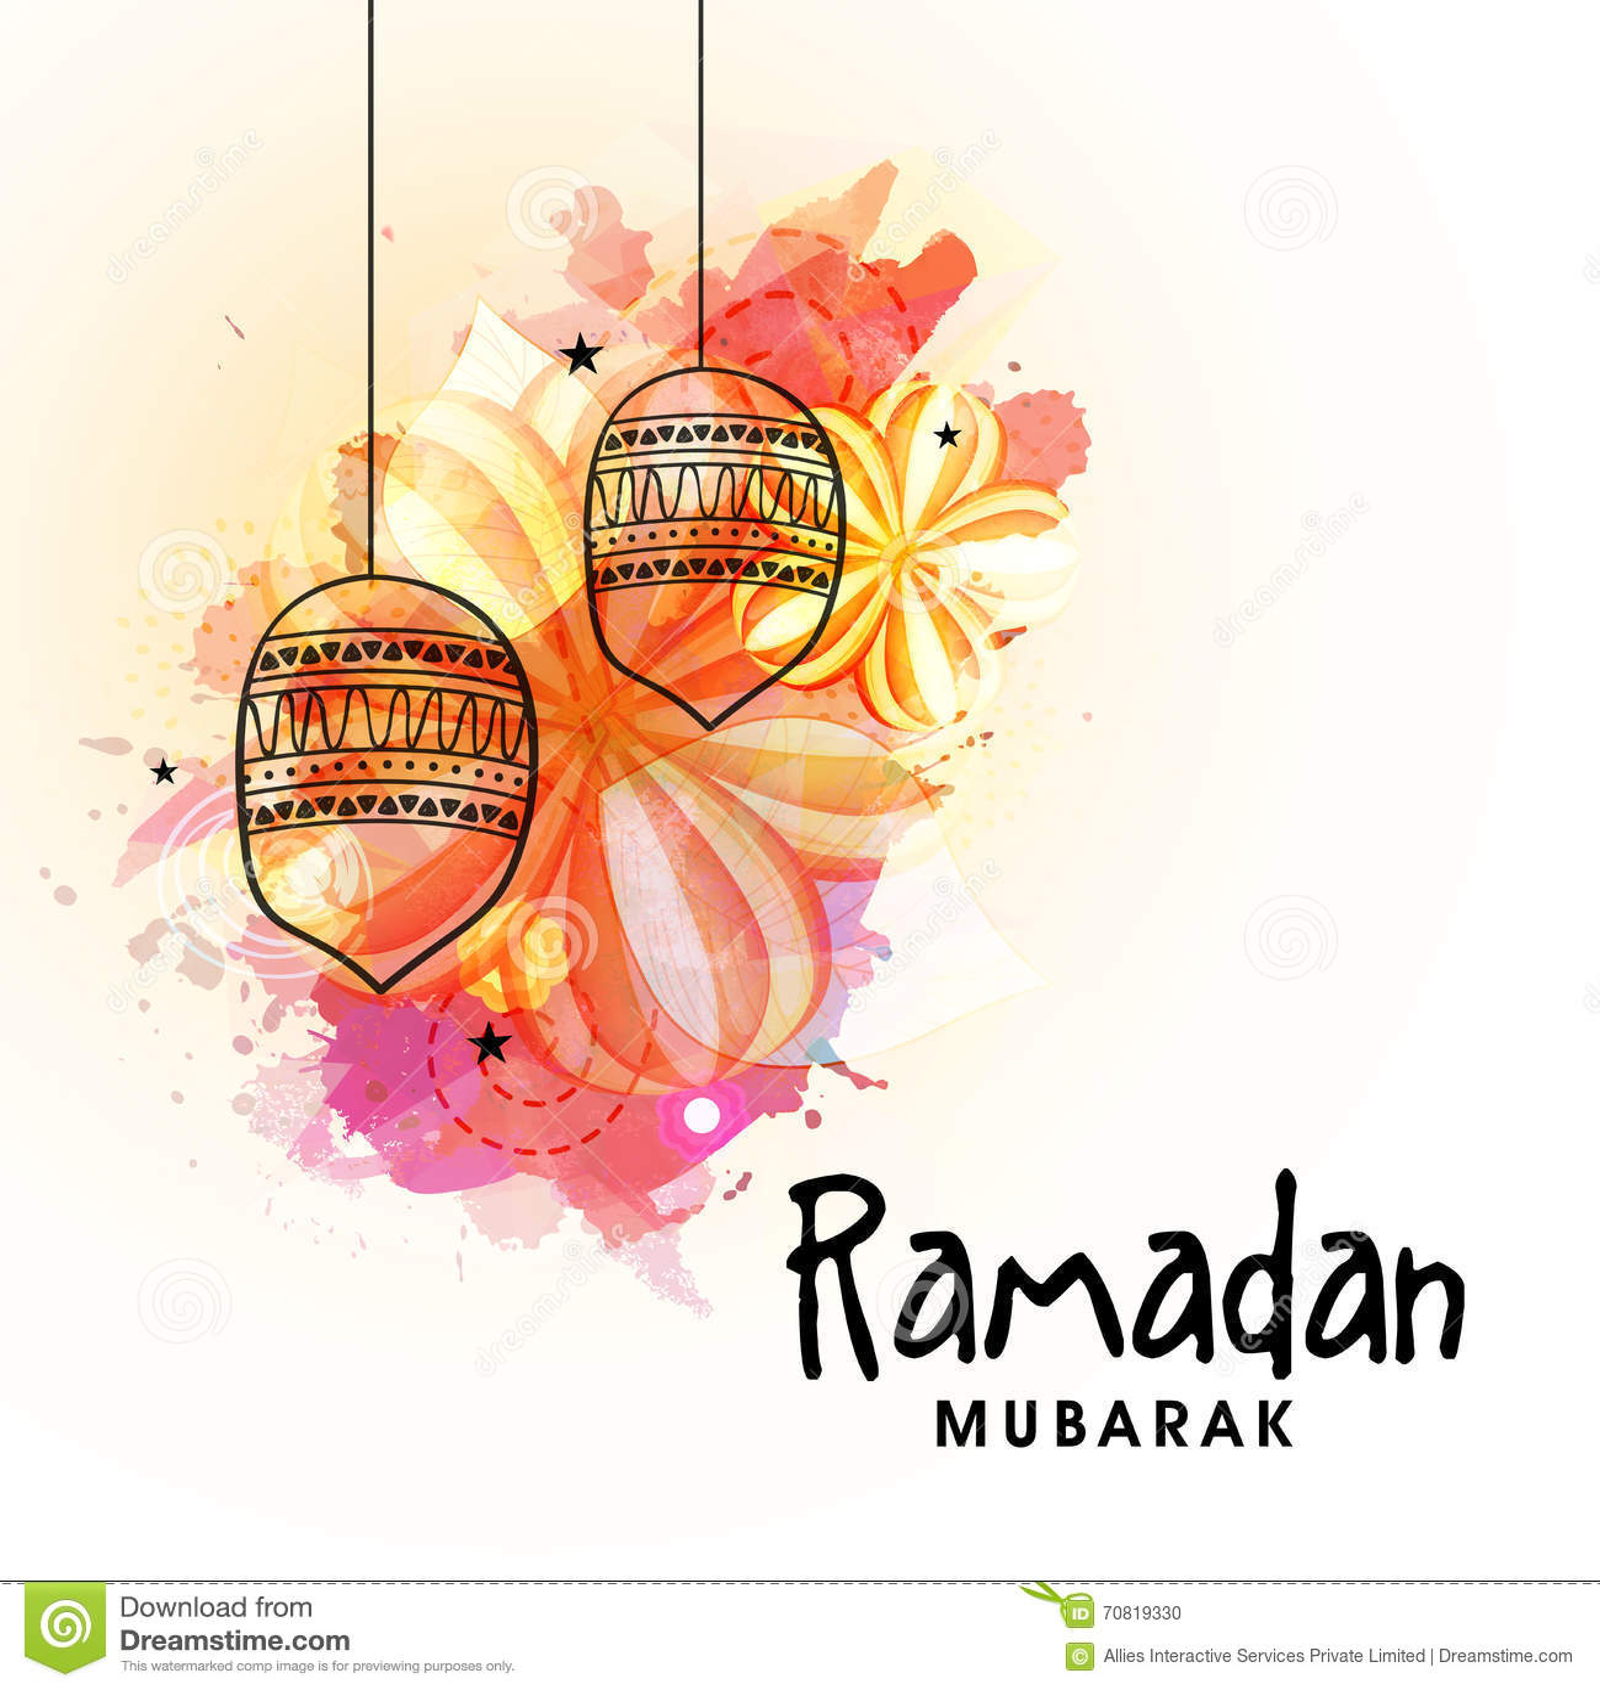 Greeting card design for ramadan mubarak stock photo image of greeting card design for ramadan mubarak m4hsunfo Choice Image